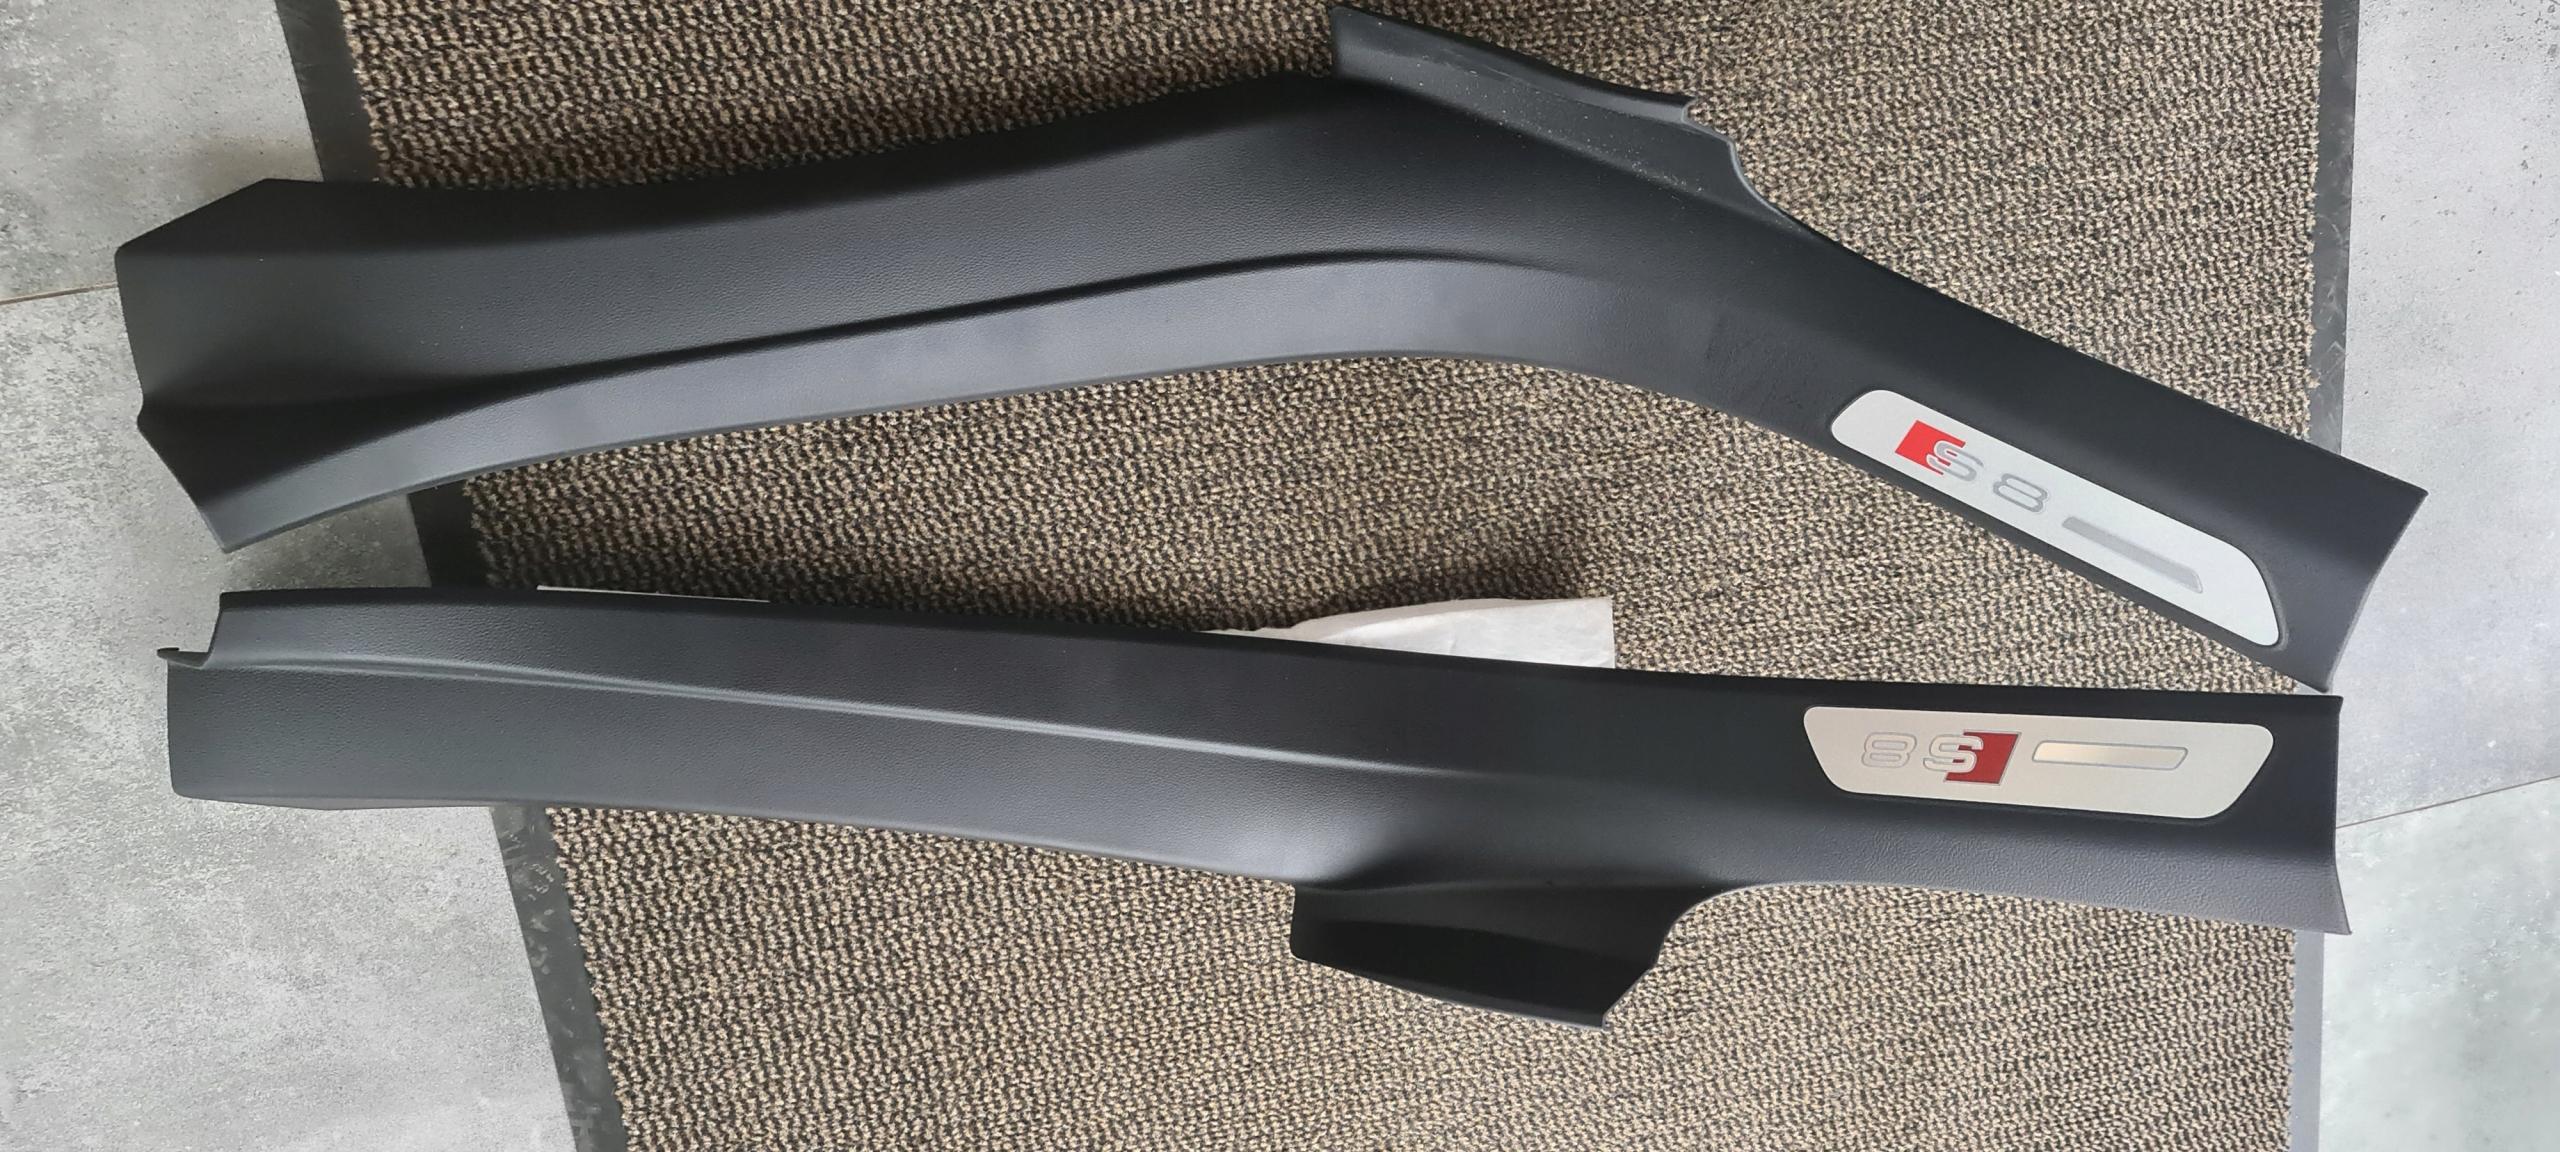 планки пороги накладки s8 d4 сзади lift компл